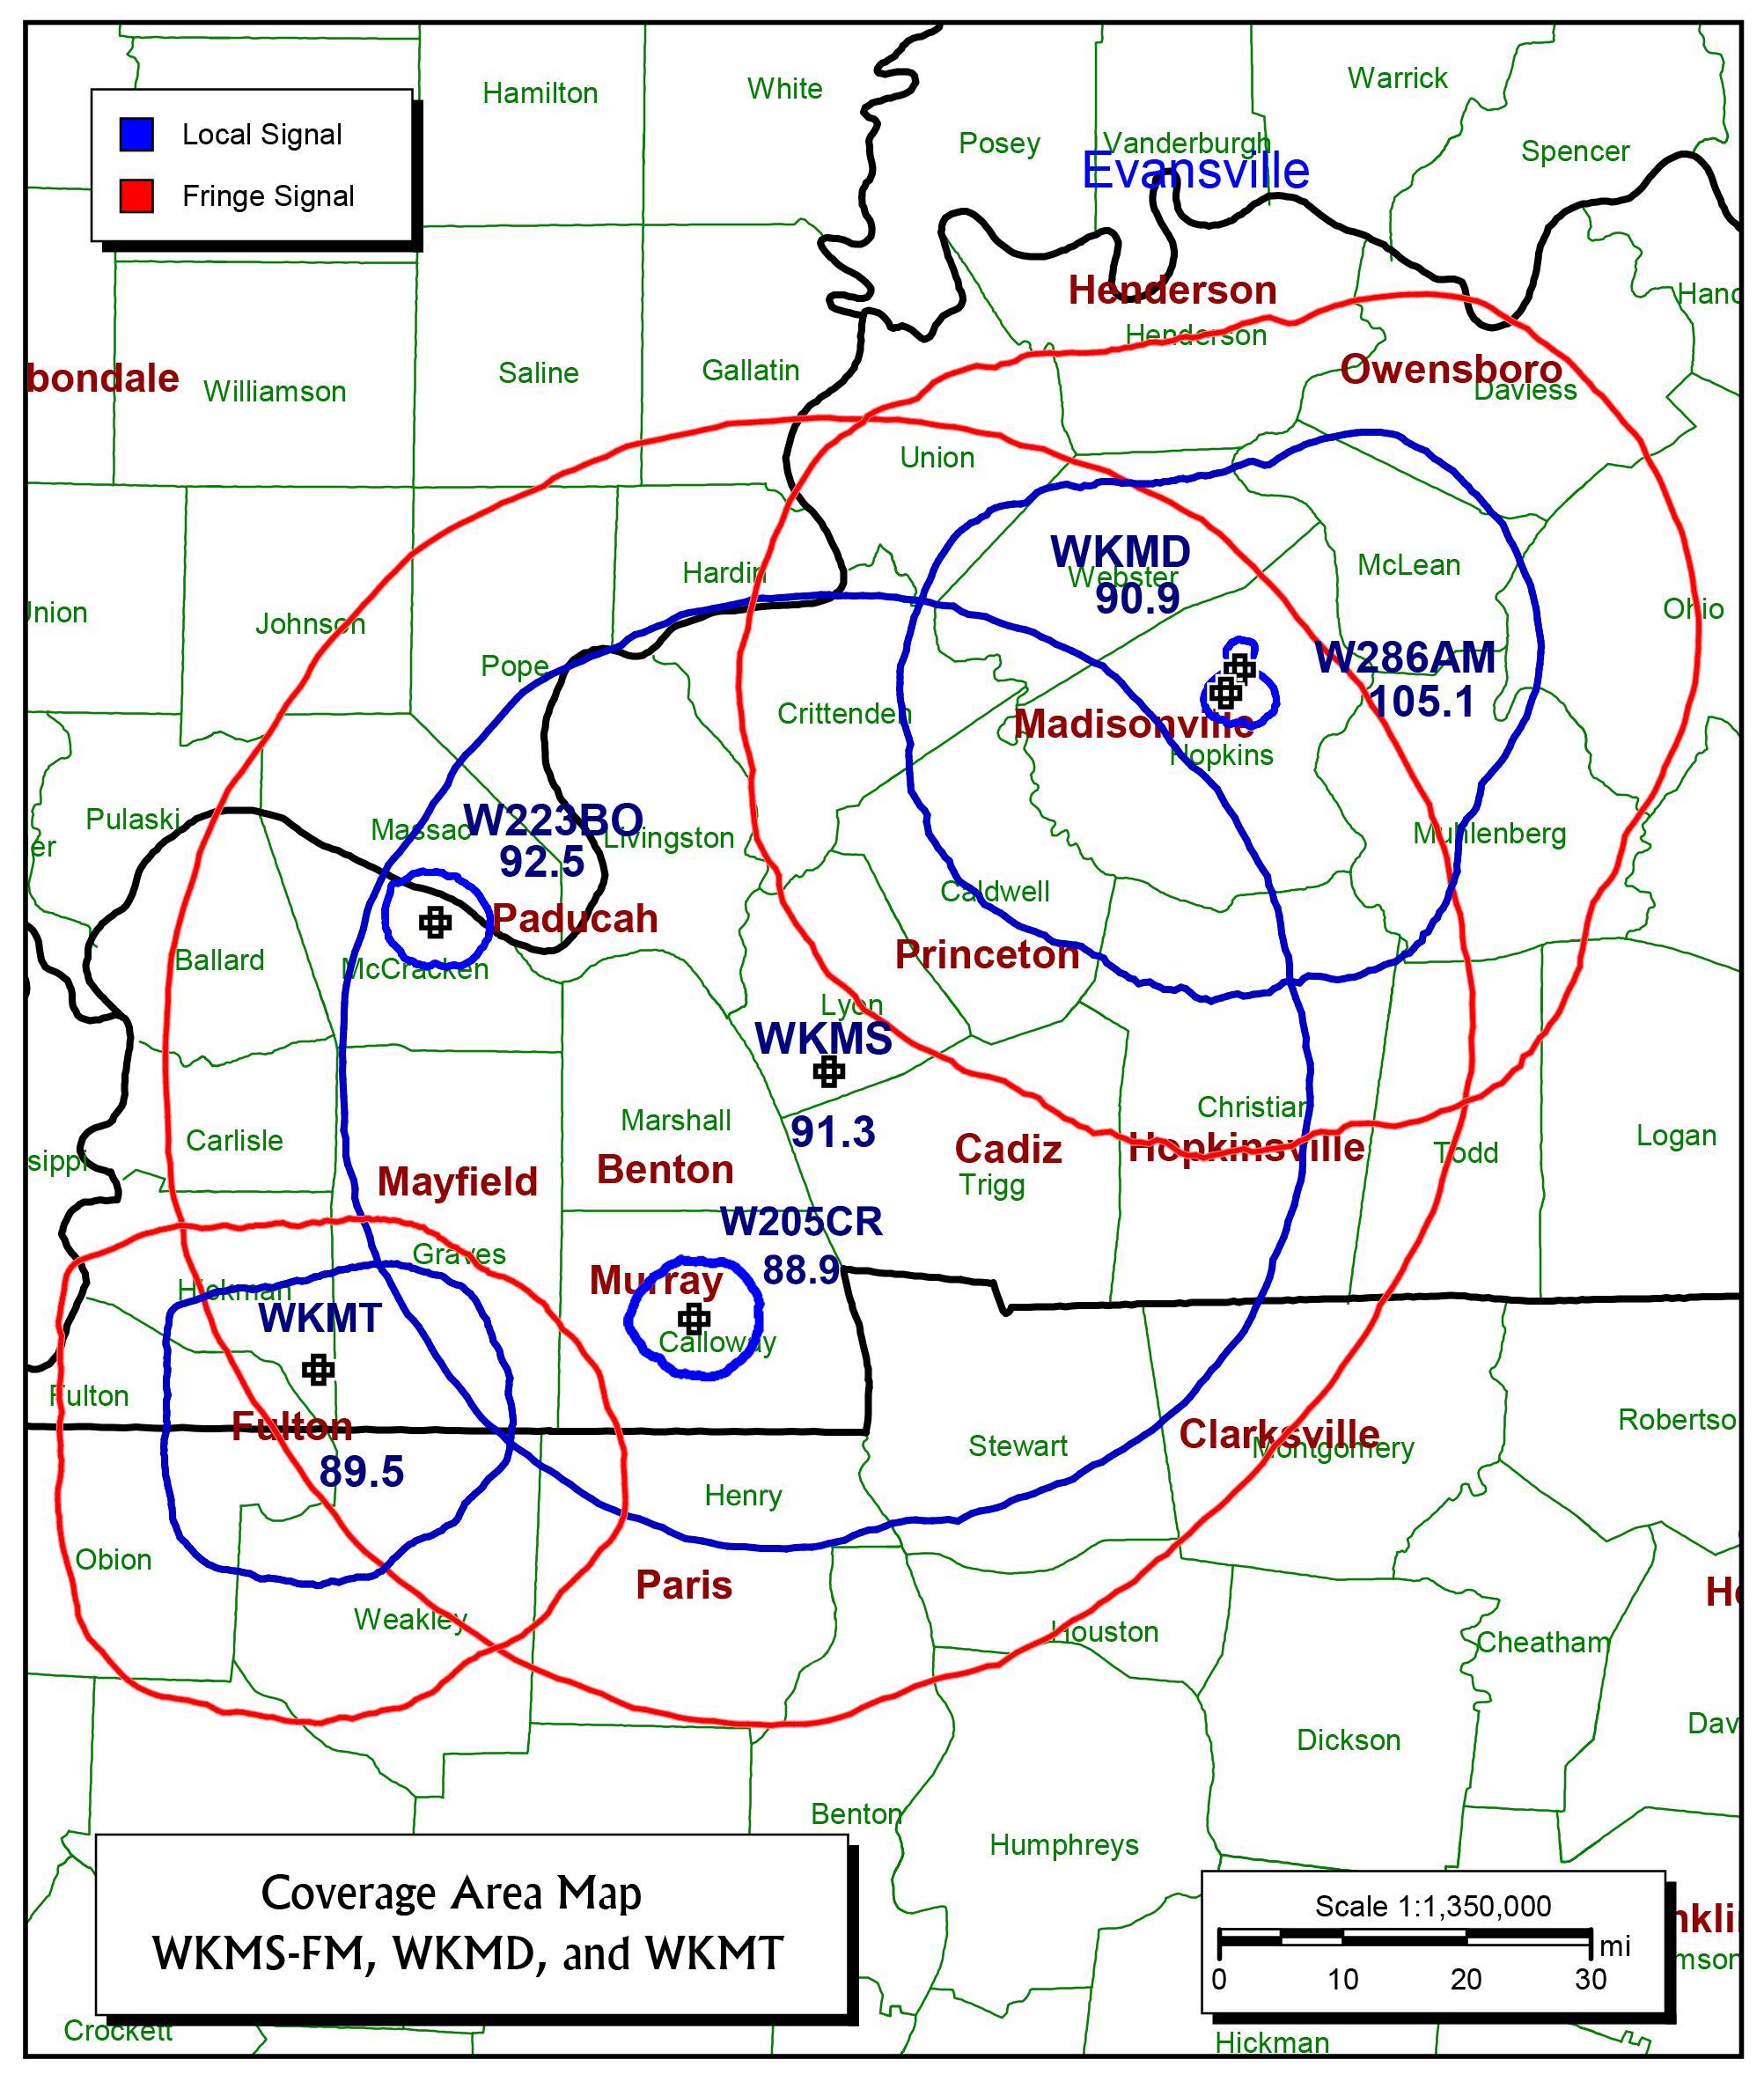 frequencies  u0026 coverage area